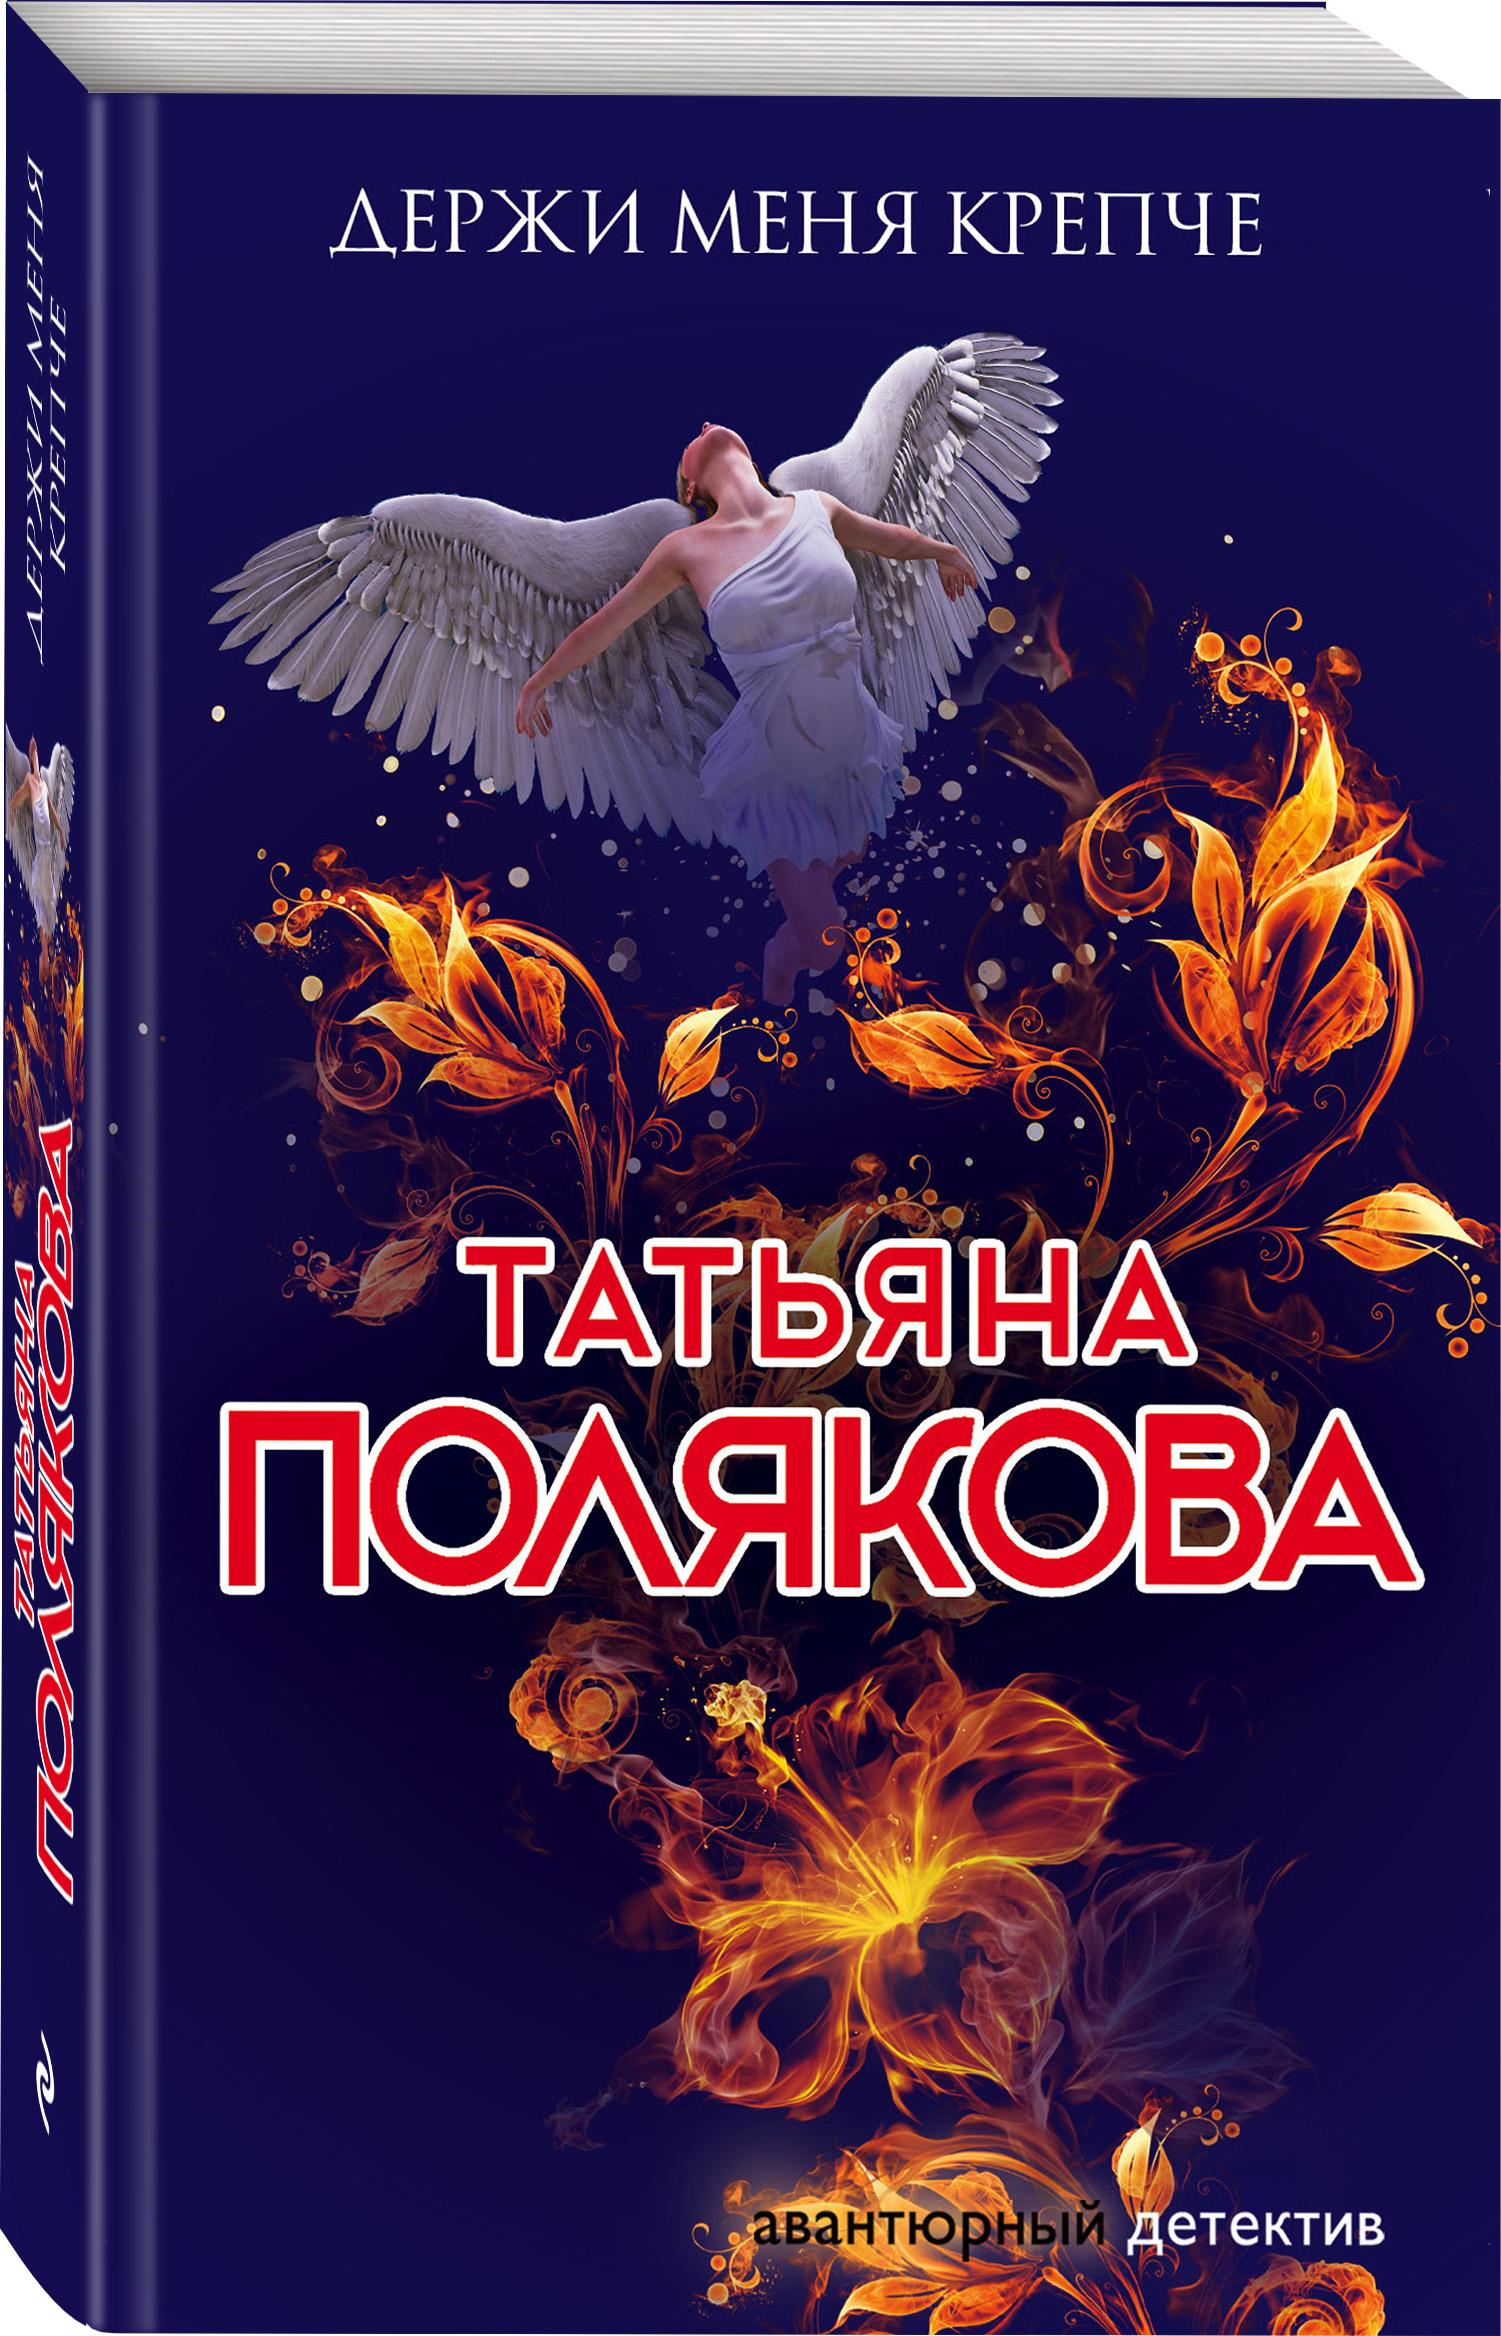 Татьяна Полякова Держи меня крепче полякова т держи меня крепче